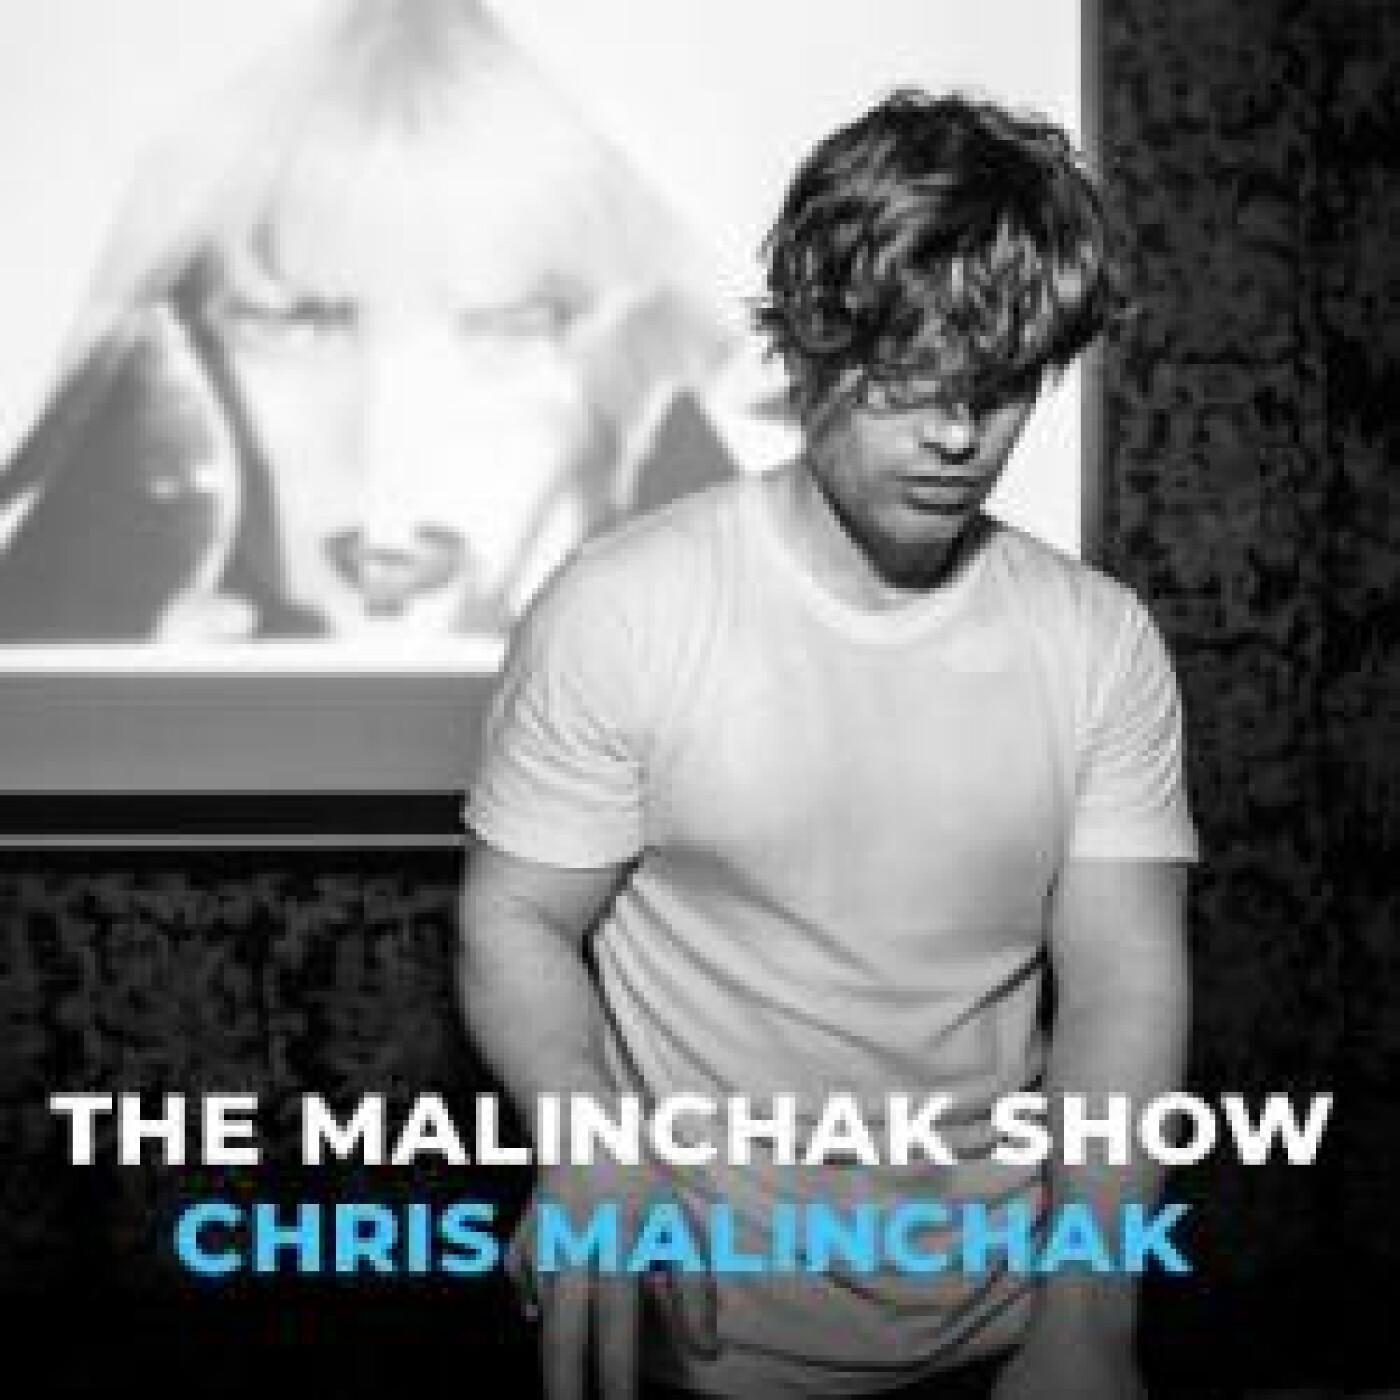 THE MALINCHAK SHOW DU 2 JUIN 2021